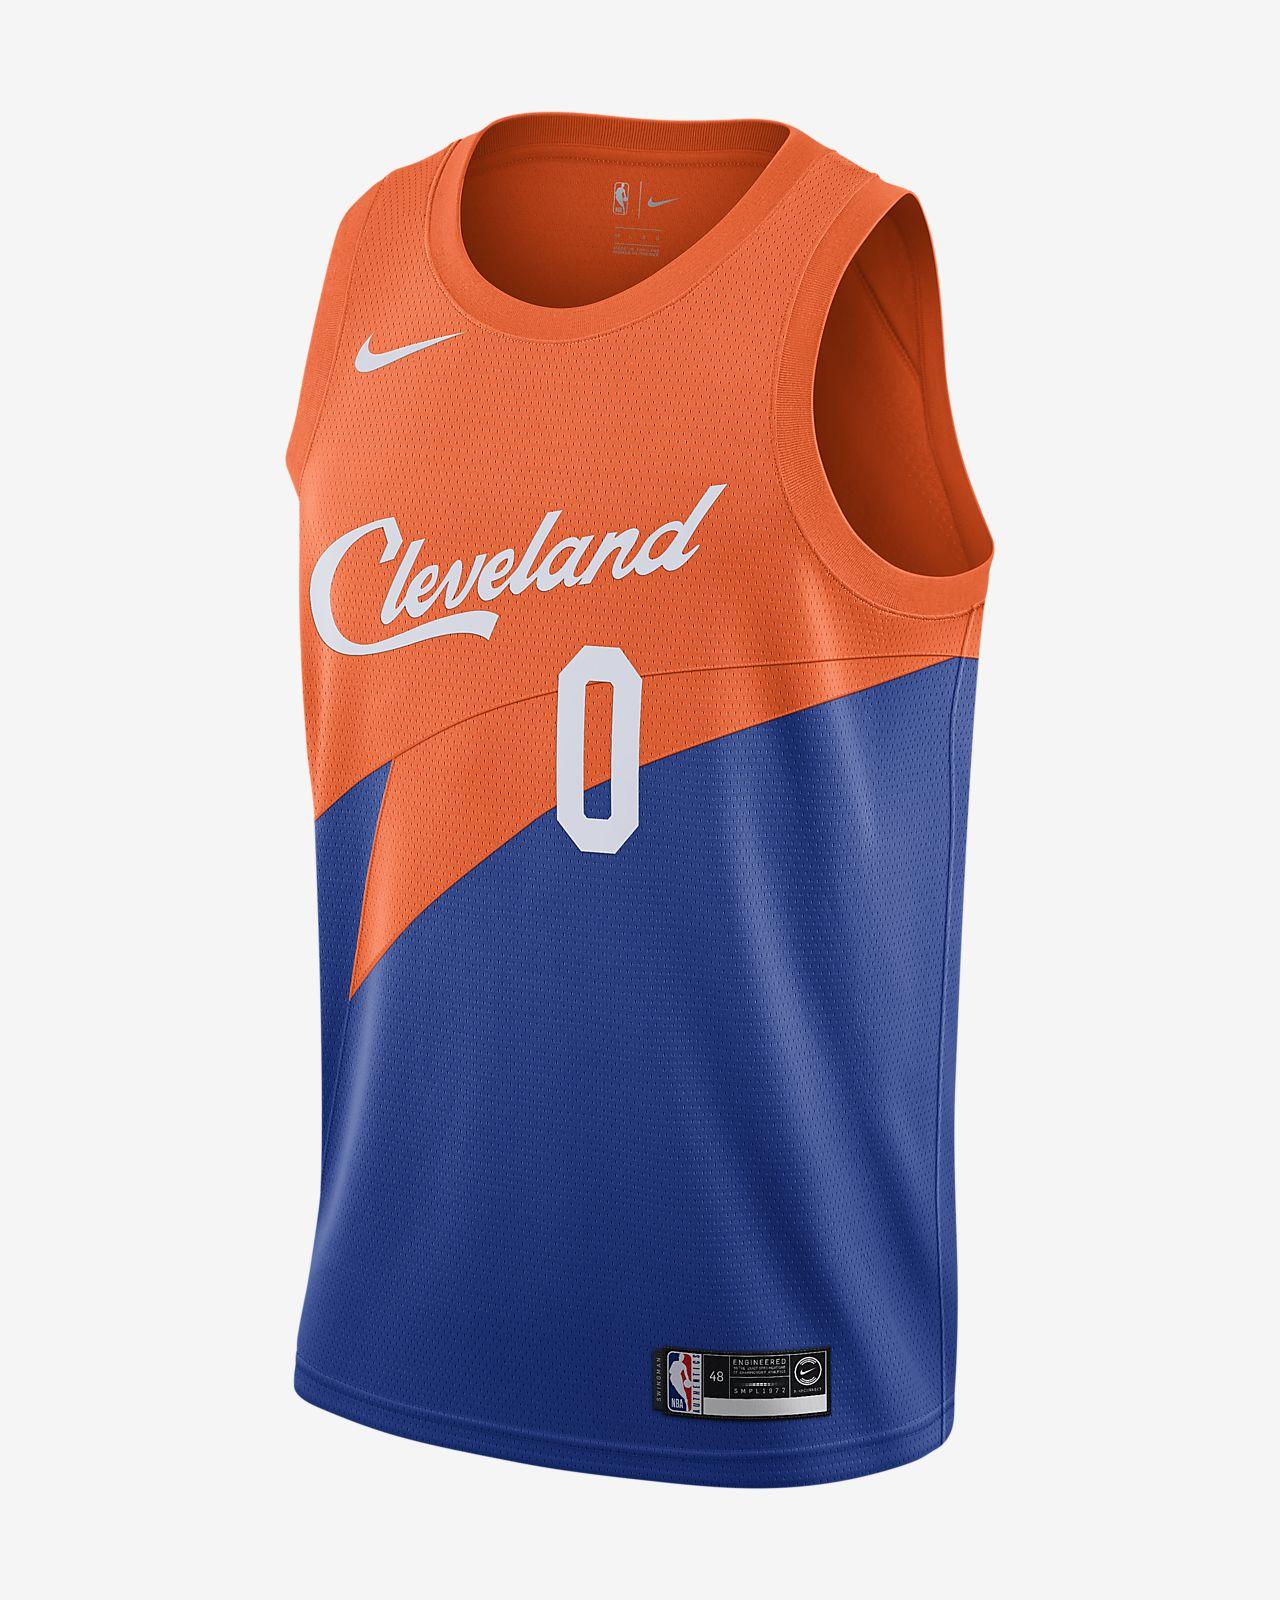 Maillot connecté Nike NBA Kevin Love City Edition Swingman (Cleveland Cavaliers) pour Homme